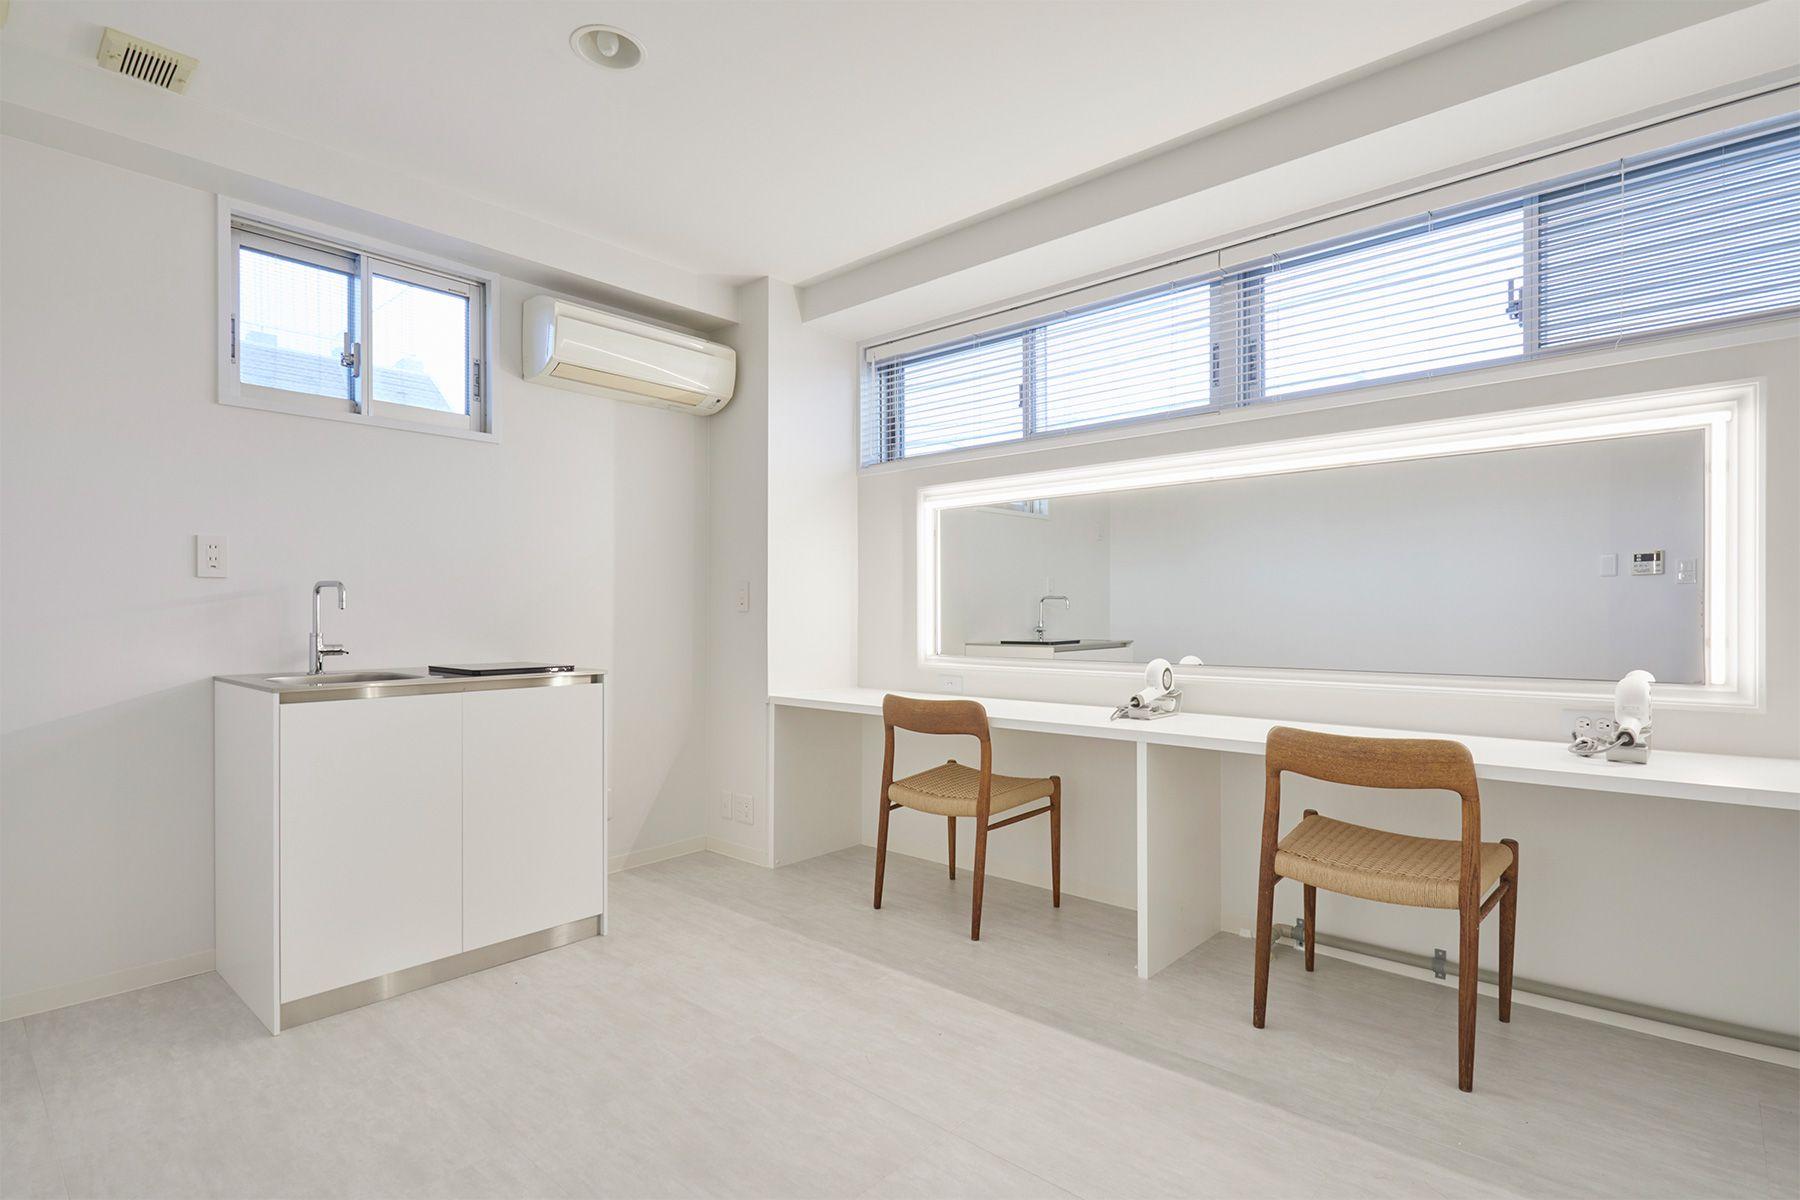 Haku Studio / THE HOUSE (ハクスタジオ)ミニキッチン